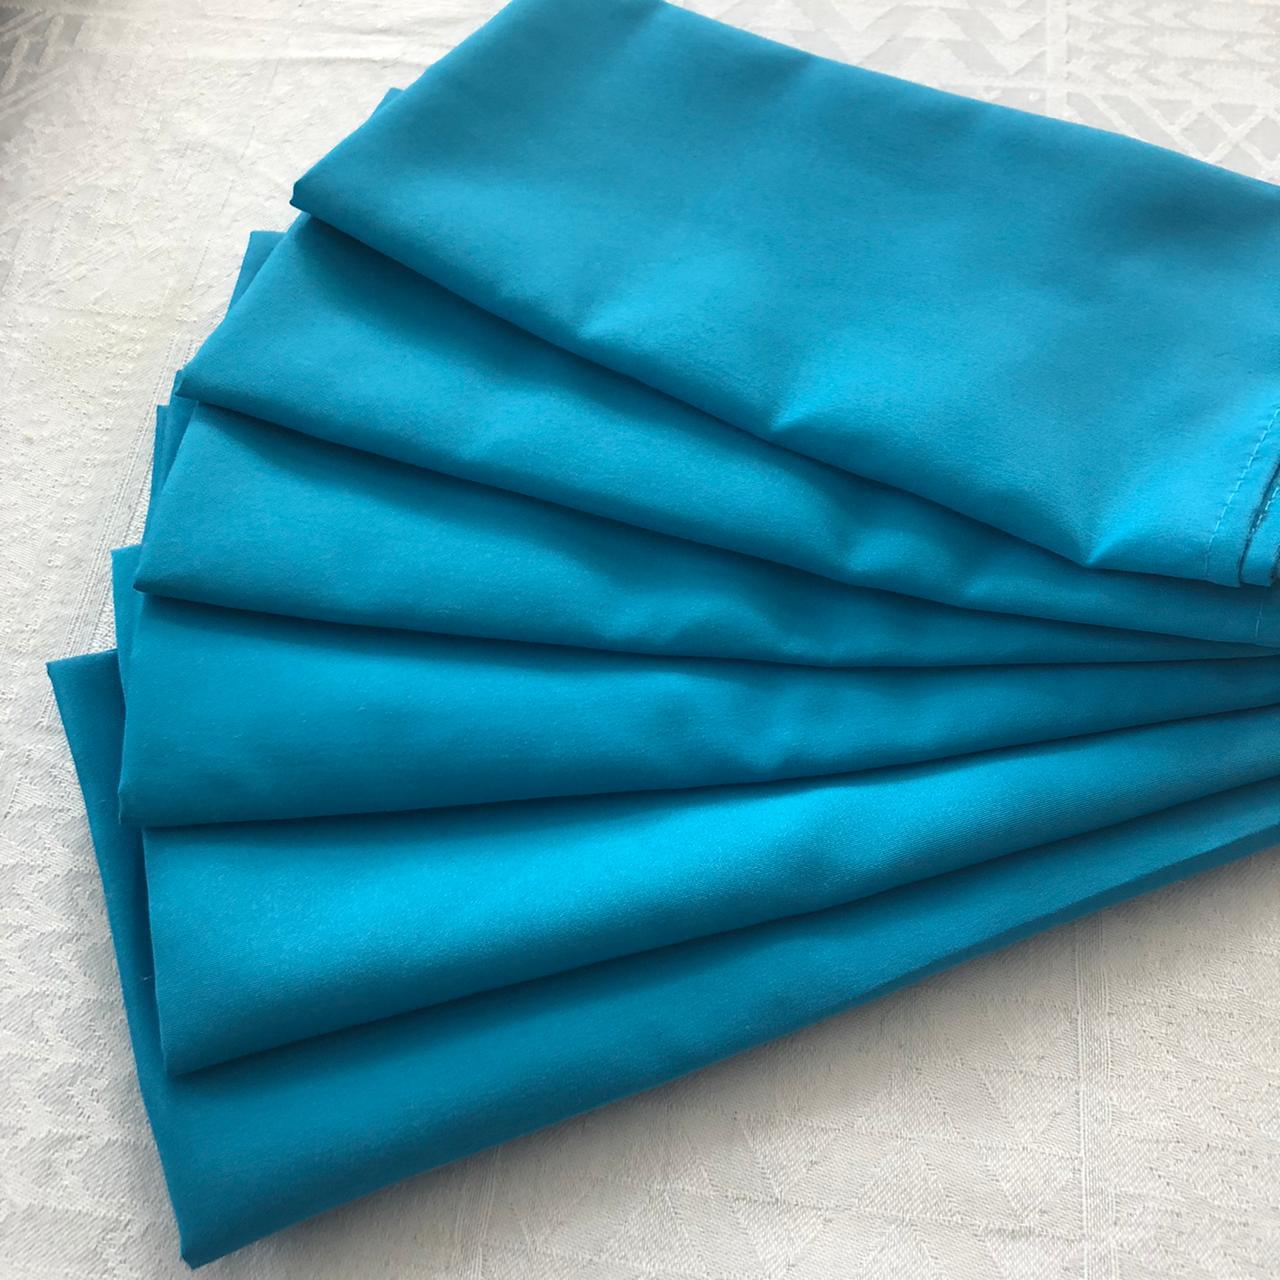 Guardanapo de tecido 6 peças Turquesa MicroOxford Paloma Home